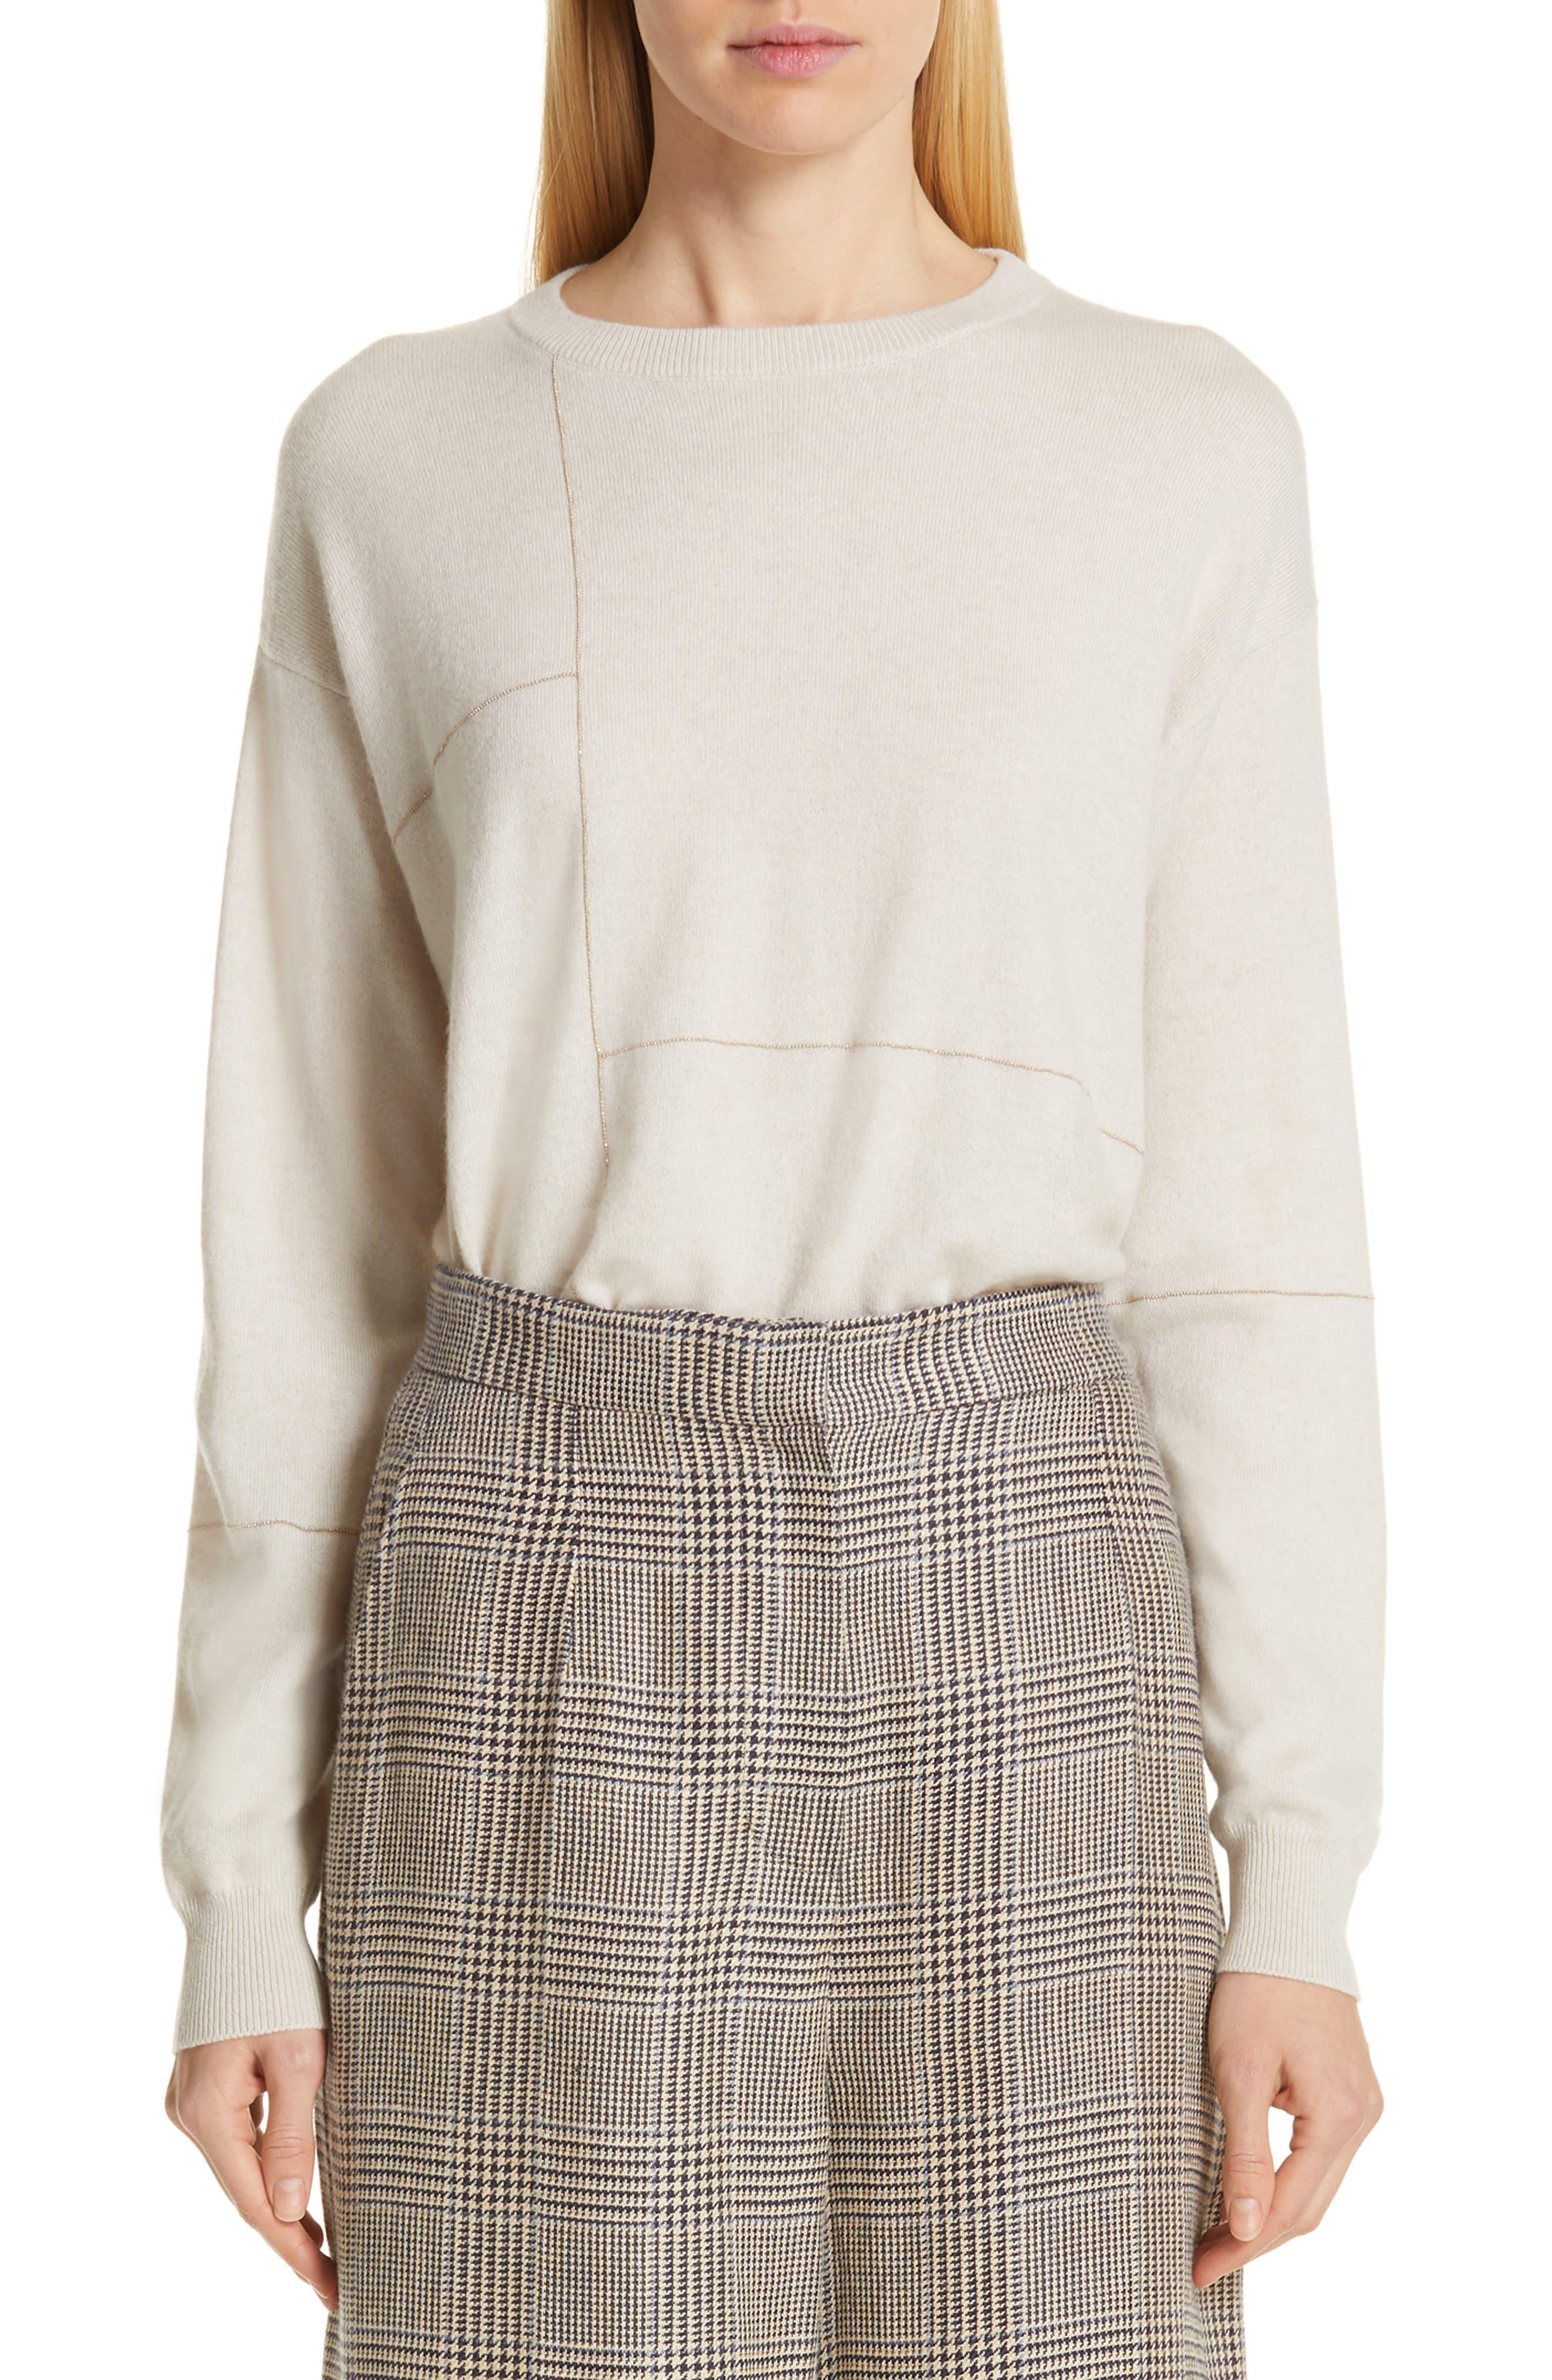 Monili Patchwork Cashmere Sweater, Main, color, BUTTERMILK